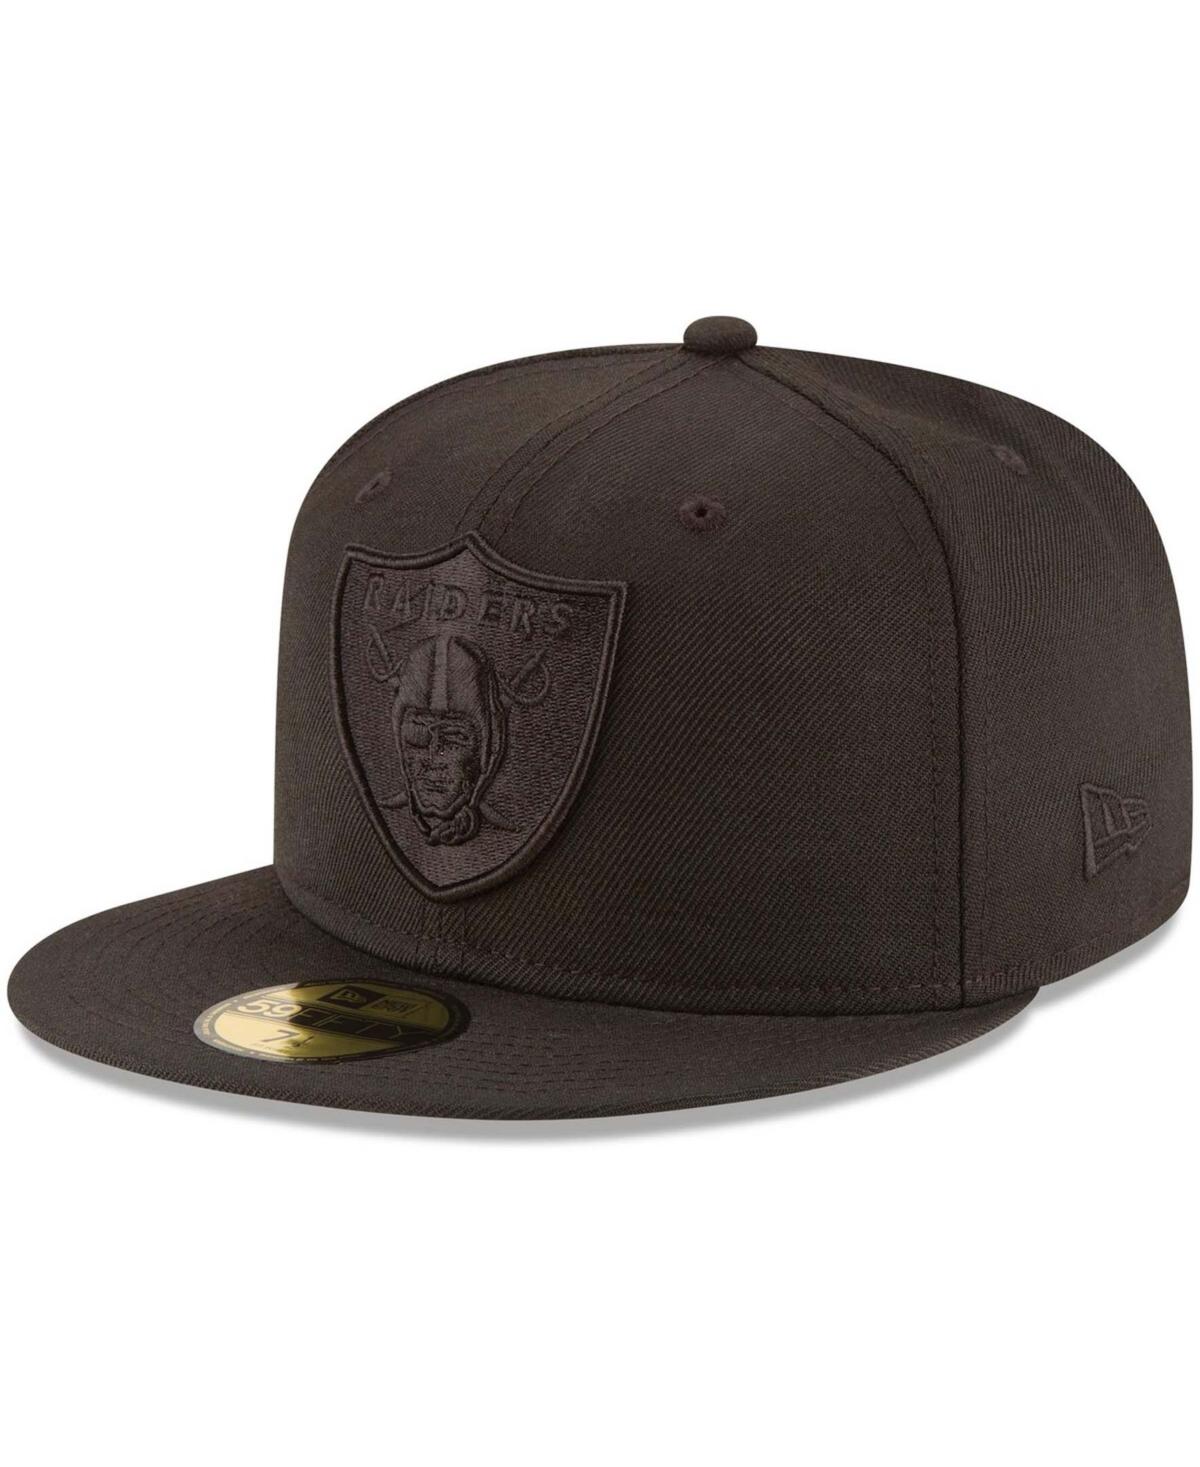 Men's Las Vegas Raiders Black on Black 59FIFTY Fitted Hat